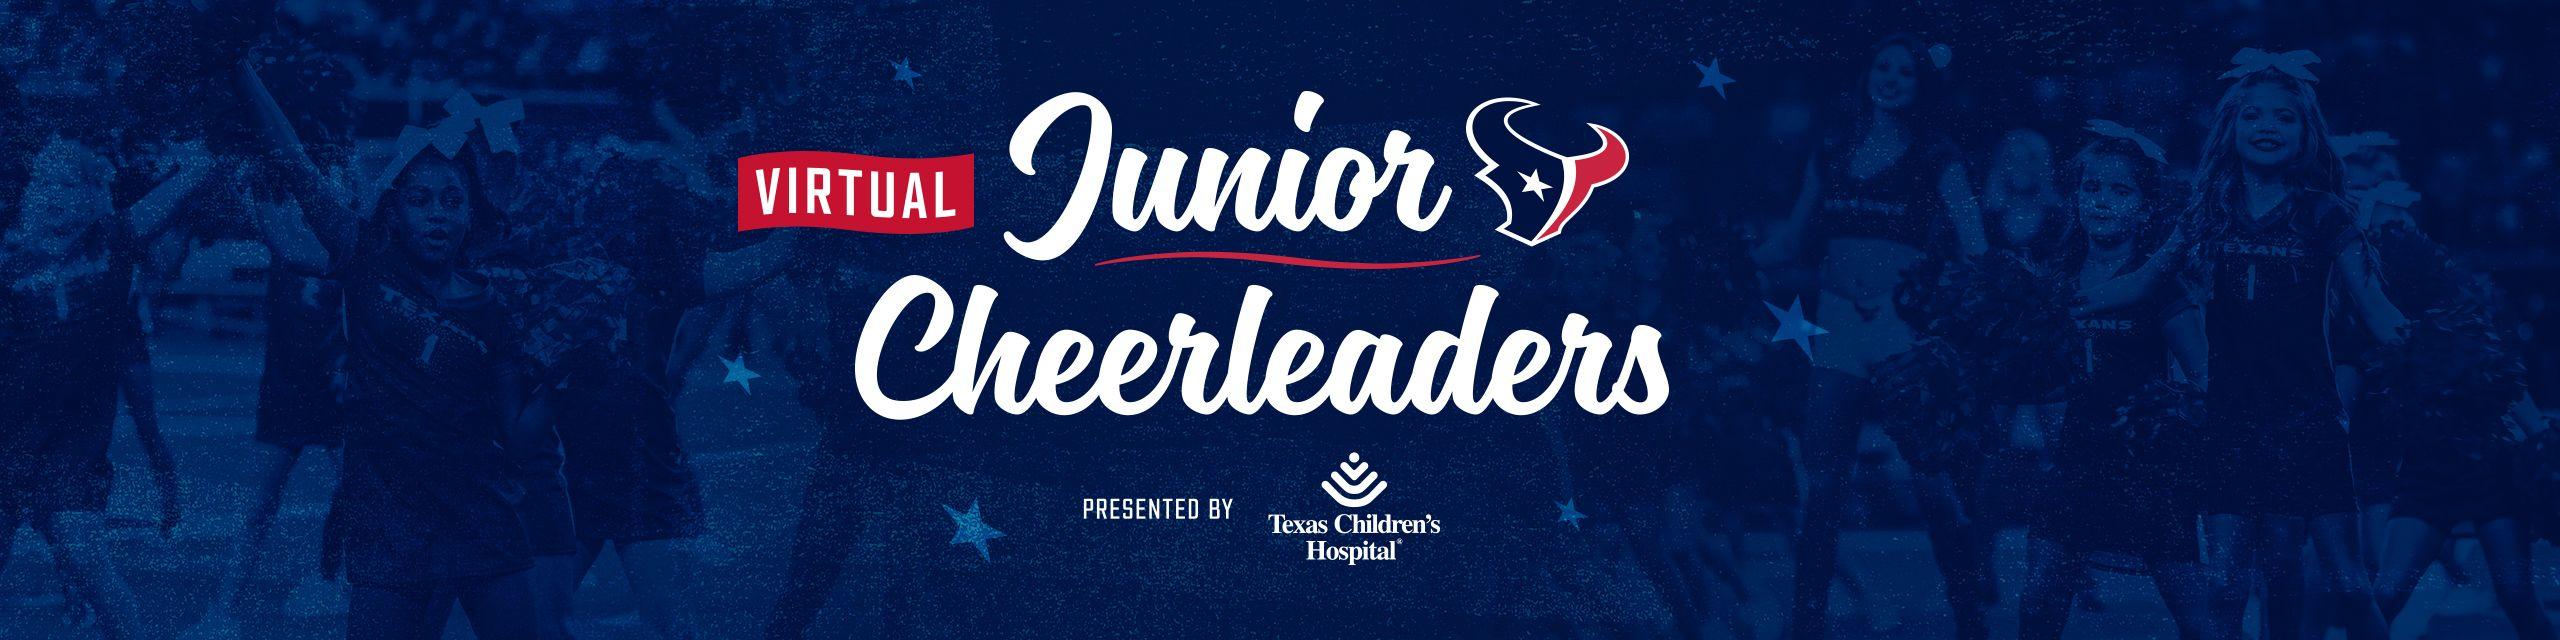 Virtual Junior Cheerleaders presented by Texas Children's Hospital